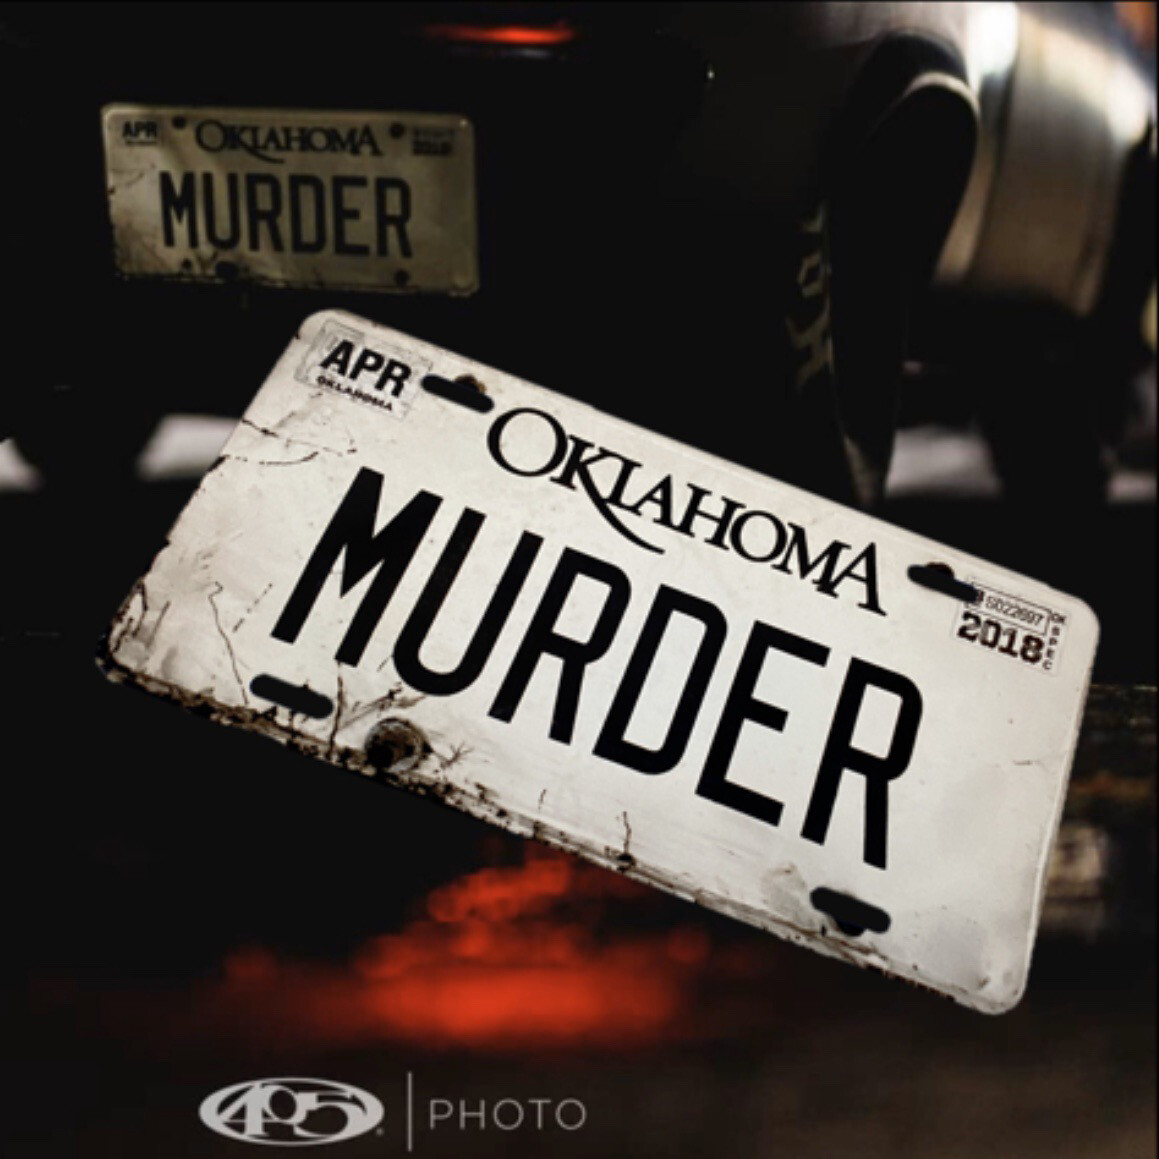 Murder Nova License plate (for Nostalgia And Decor ONLY)